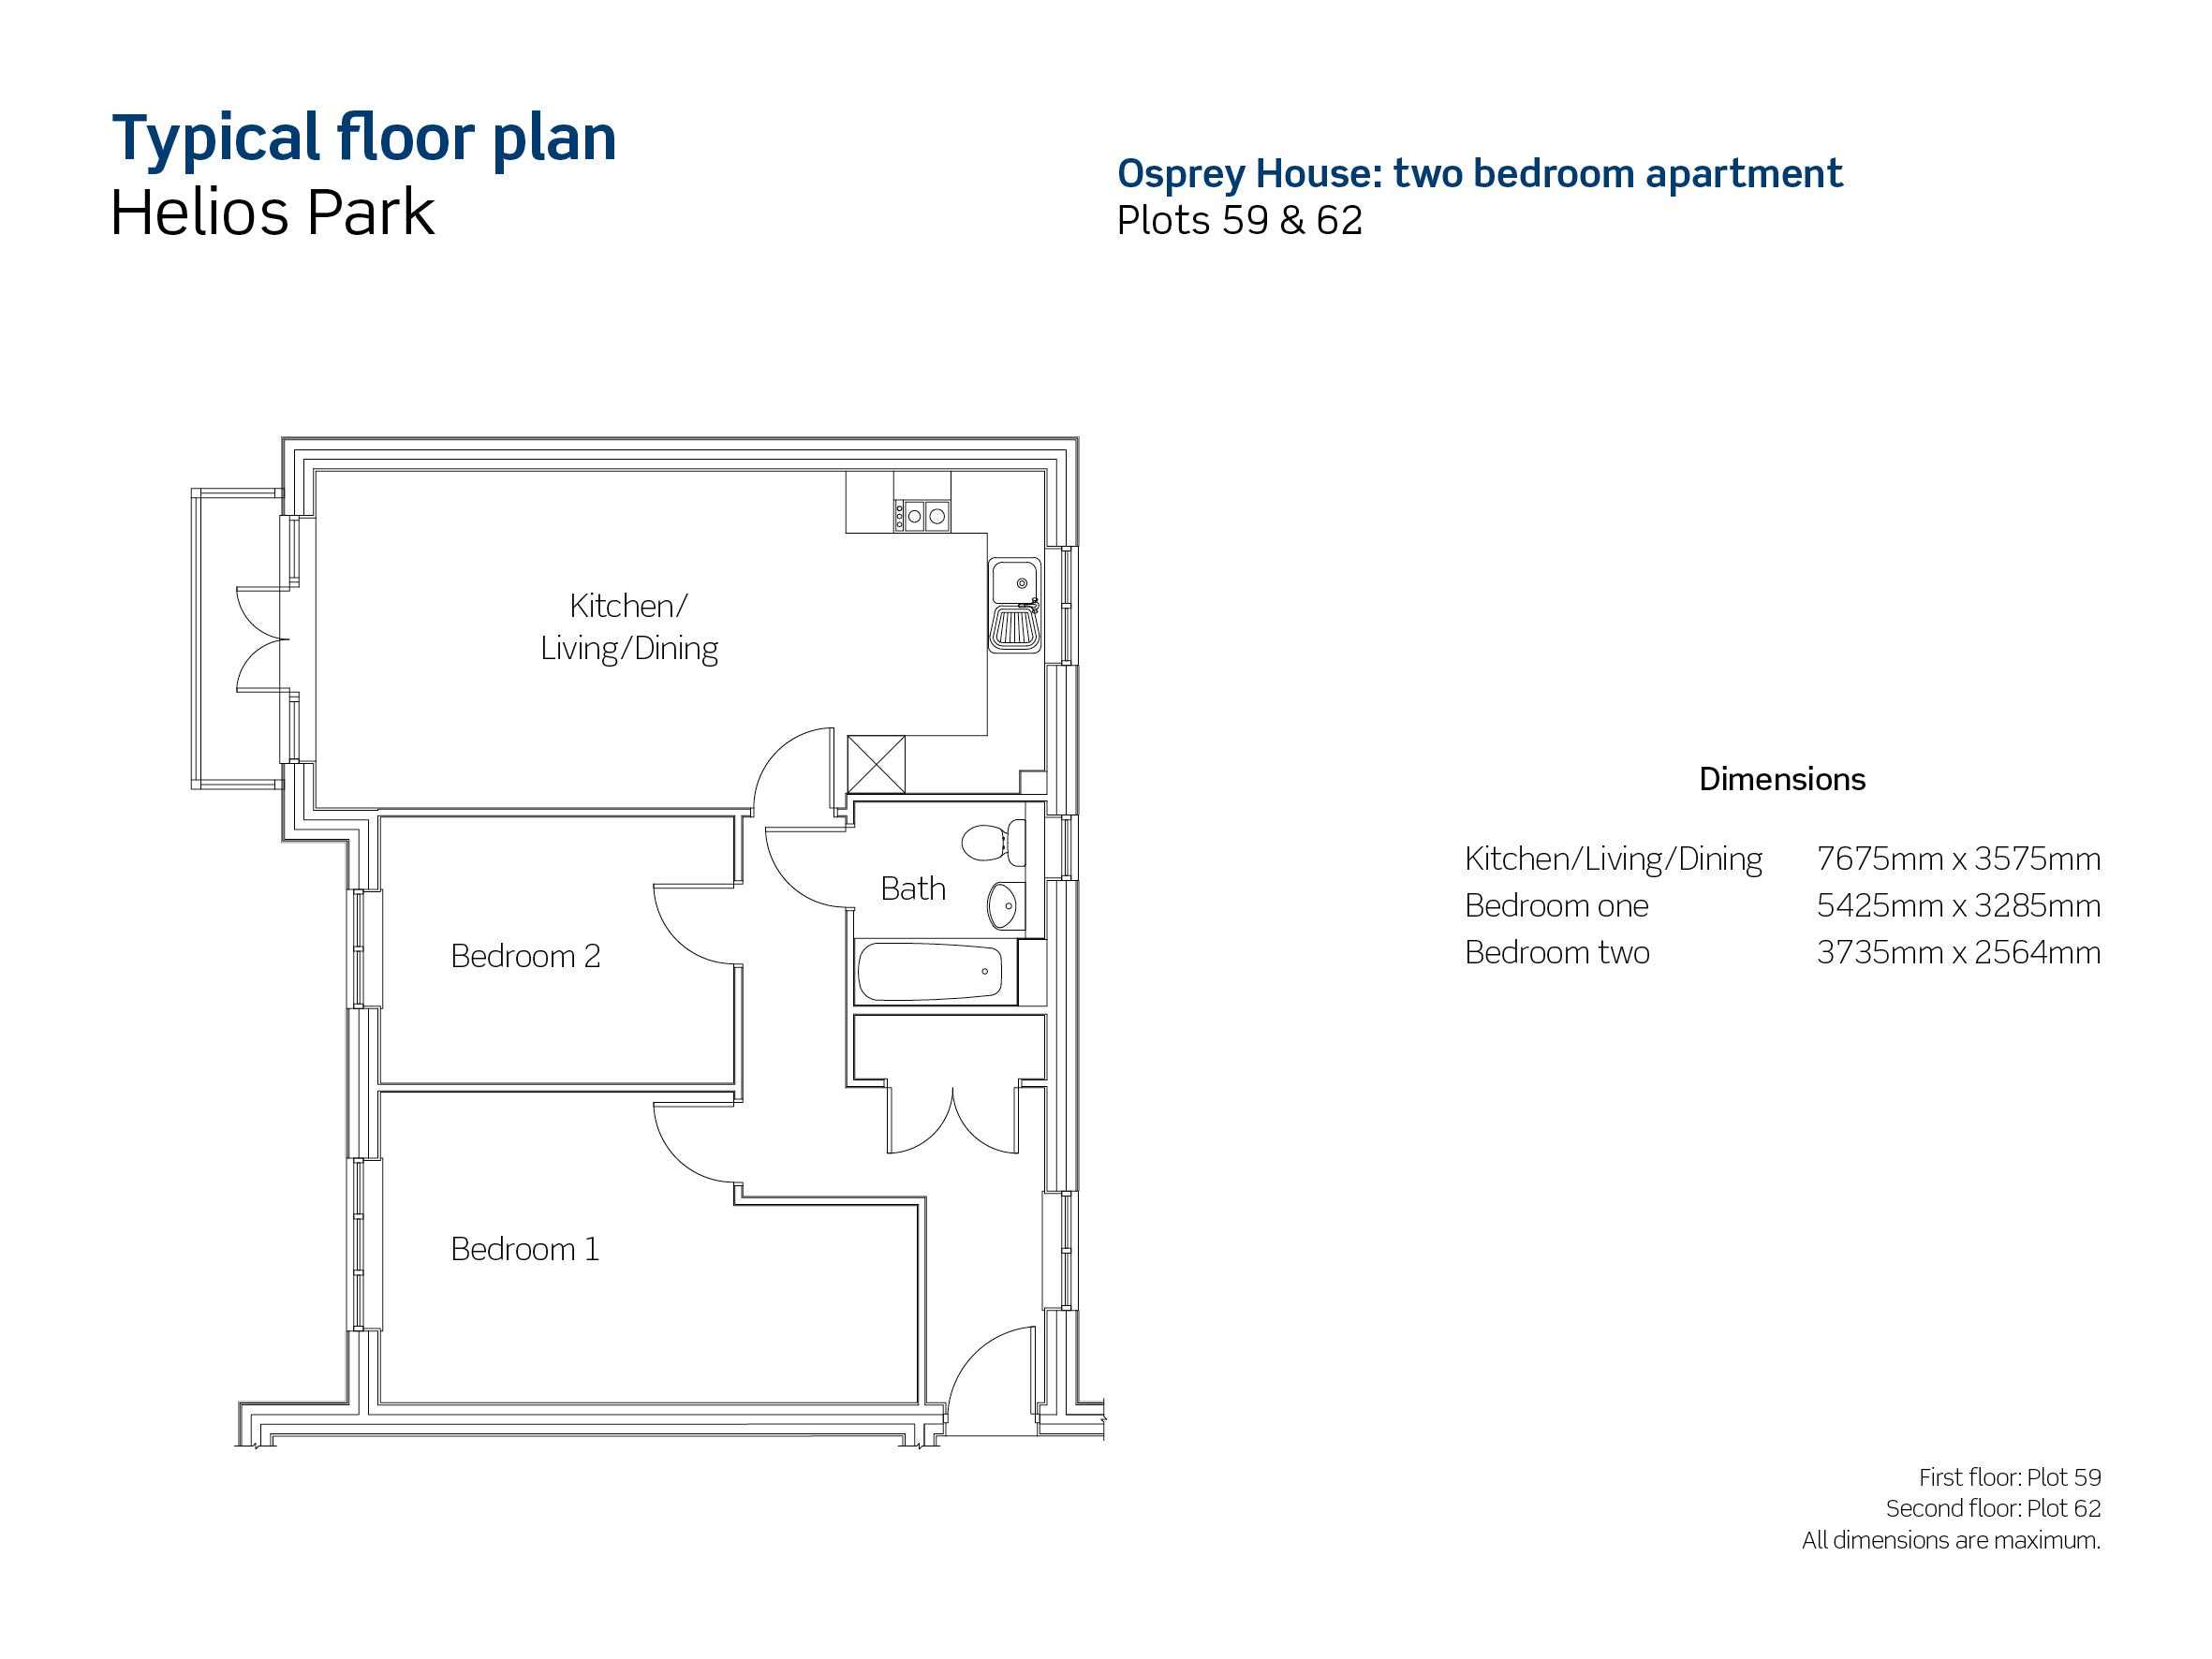 Helios Park plot 59 floor plan